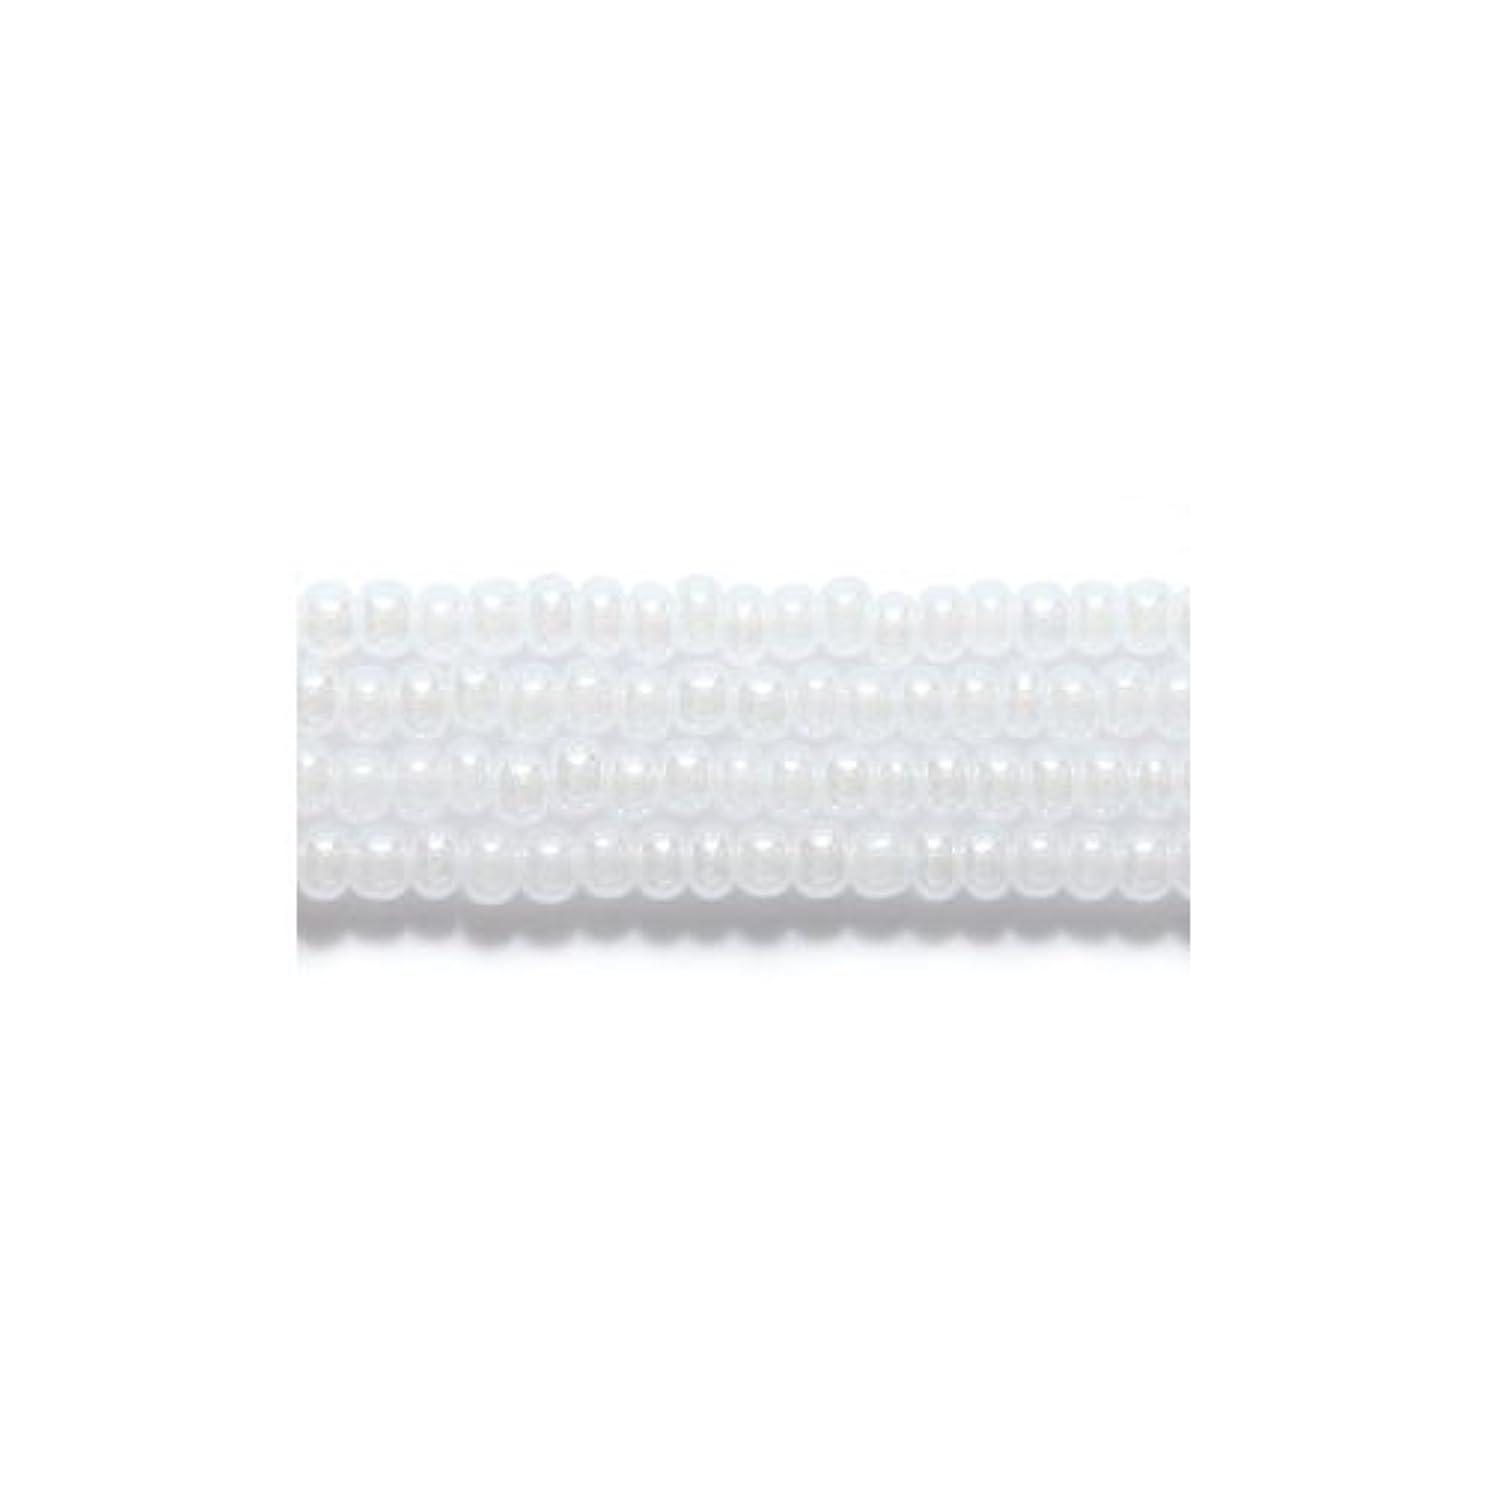 Preciosa Ornela Czech Seed Bead, Pearl White, Size 10/0